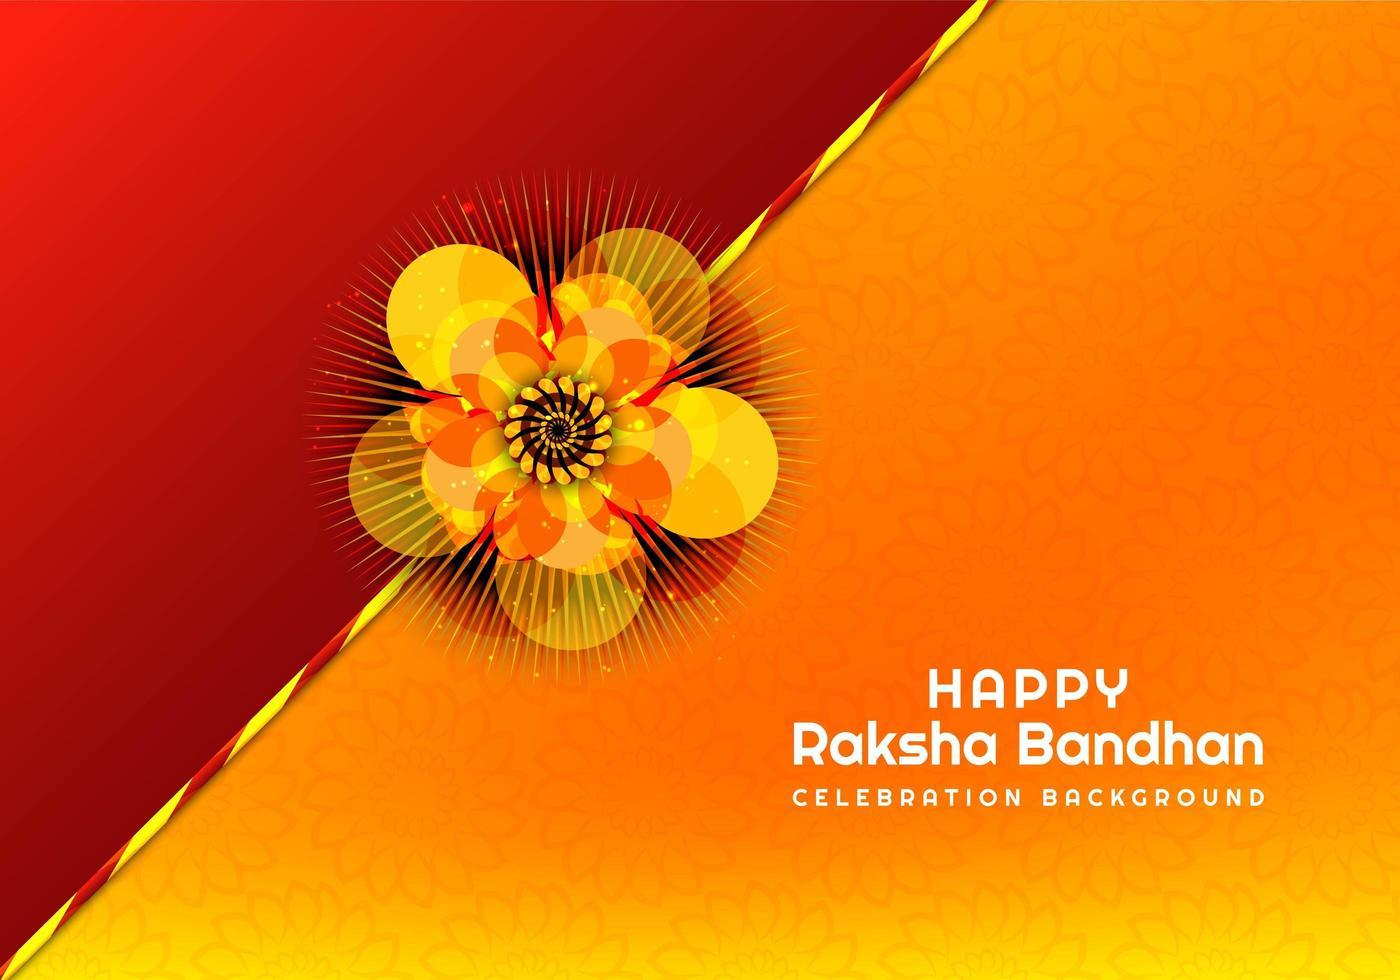 rakhi per carta bandhan raksha vettore